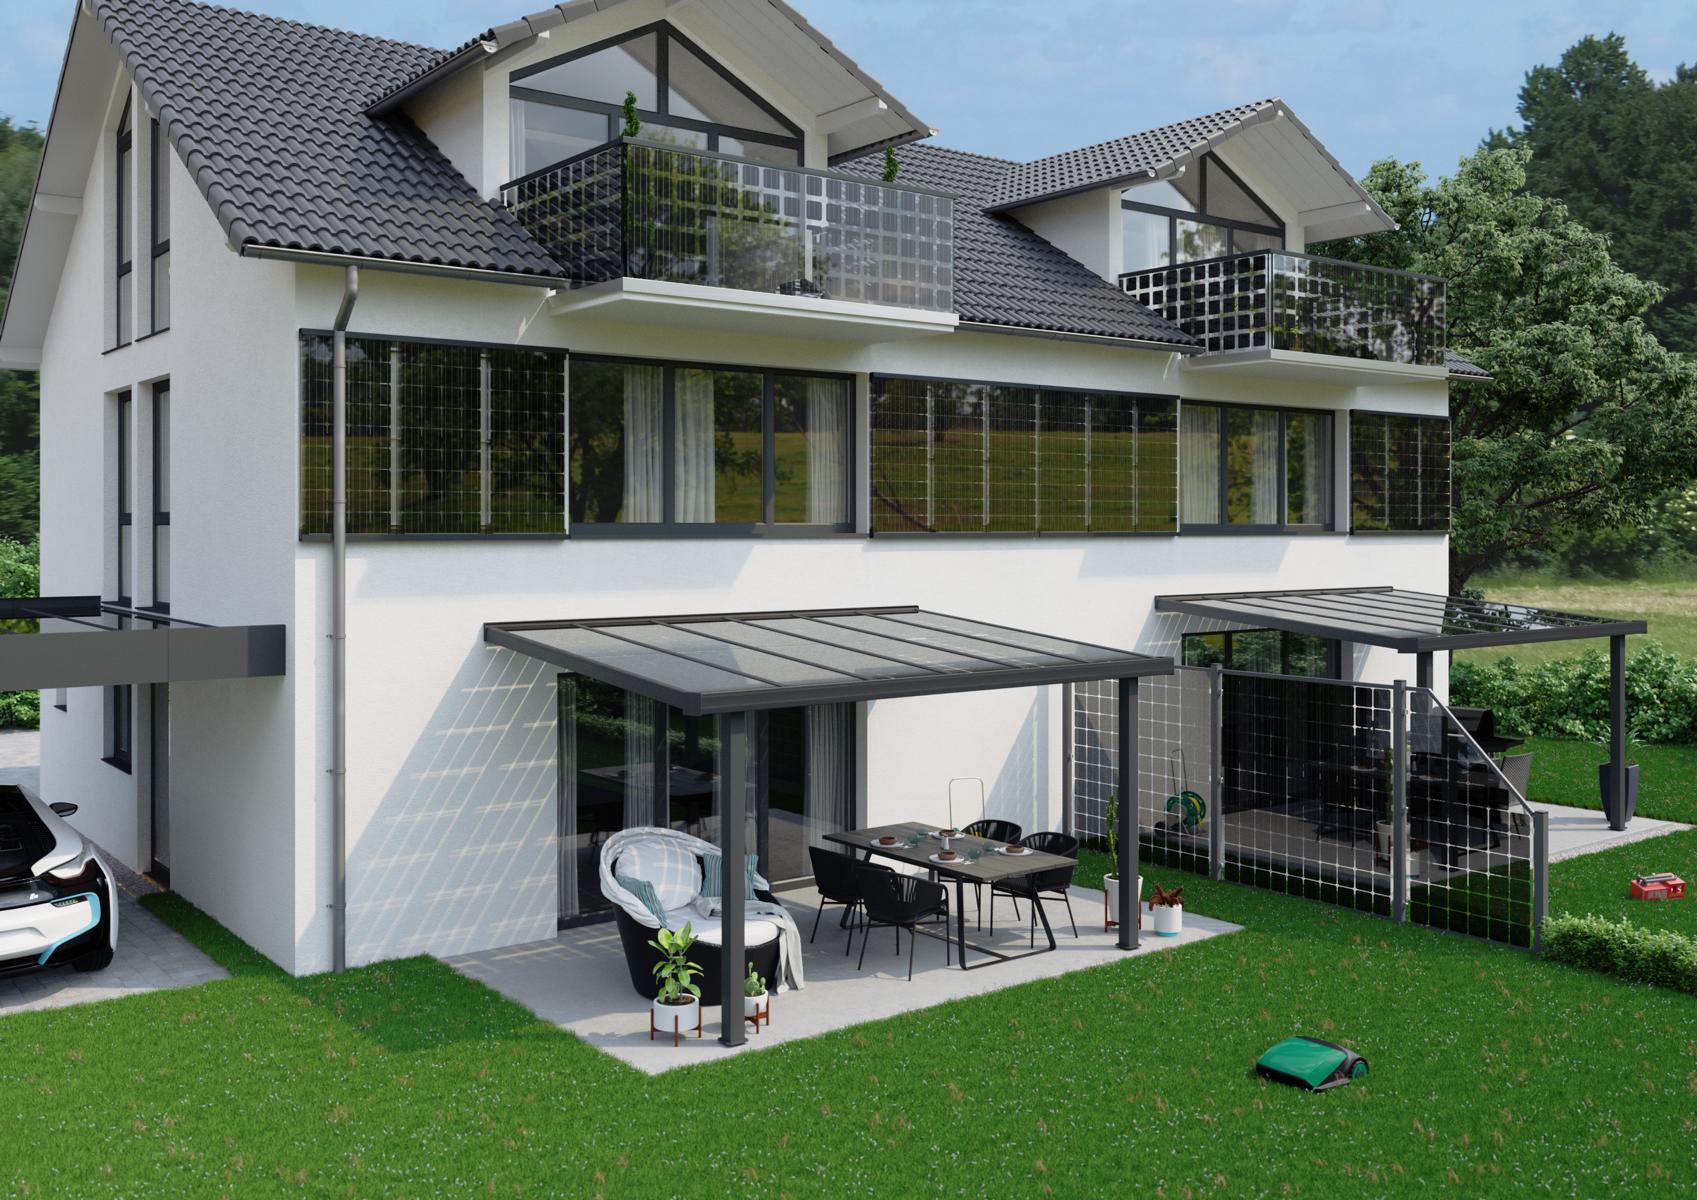 niedrigenergiehaus premium solarglas terrassen berdachung. Black Bedroom Furniture Sets. Home Design Ideas